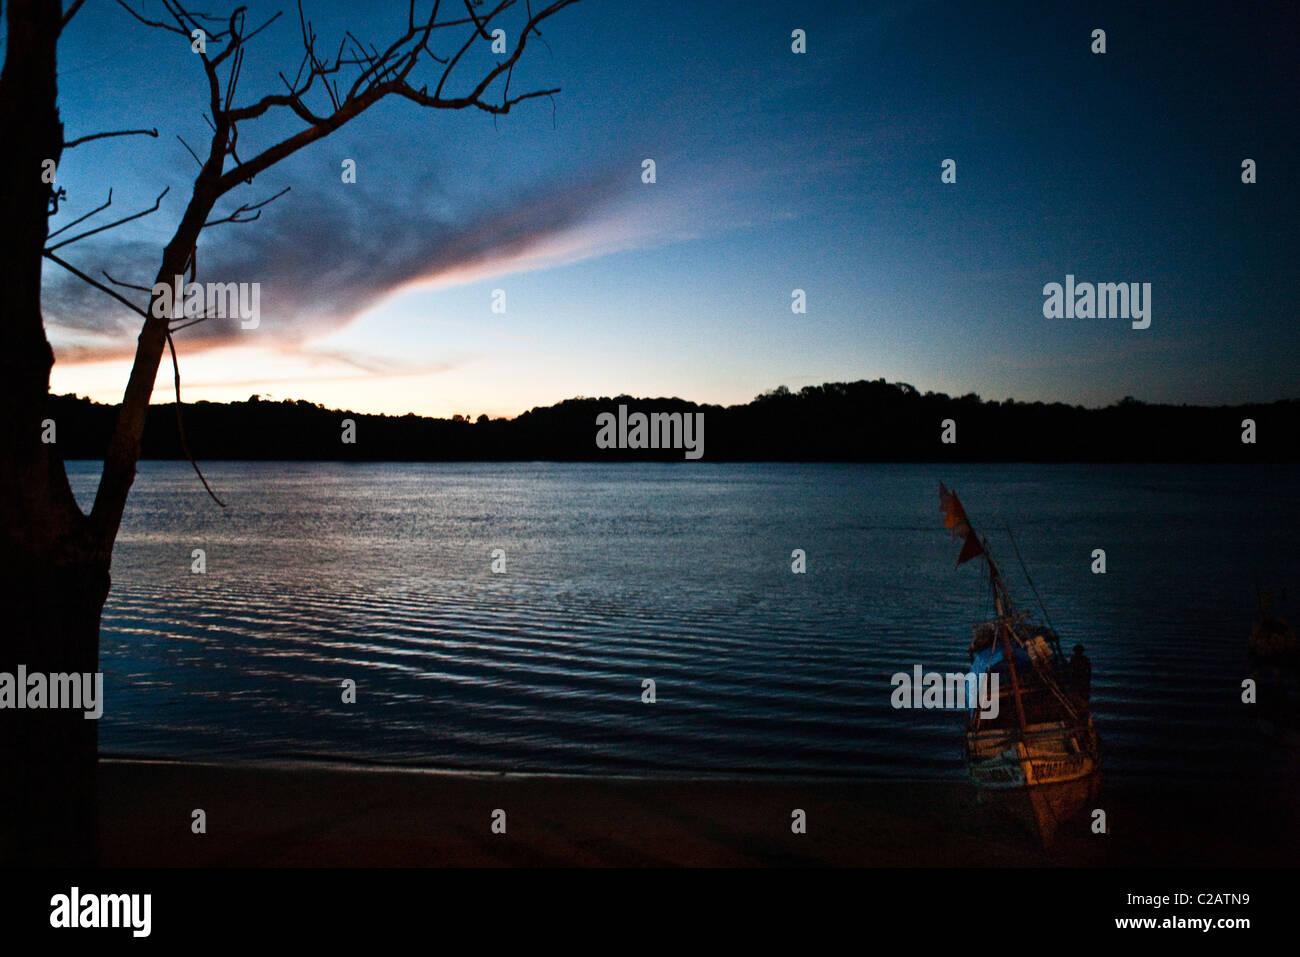 South America, Amazon, fishing boat coming into shore at dusk - Stock Image